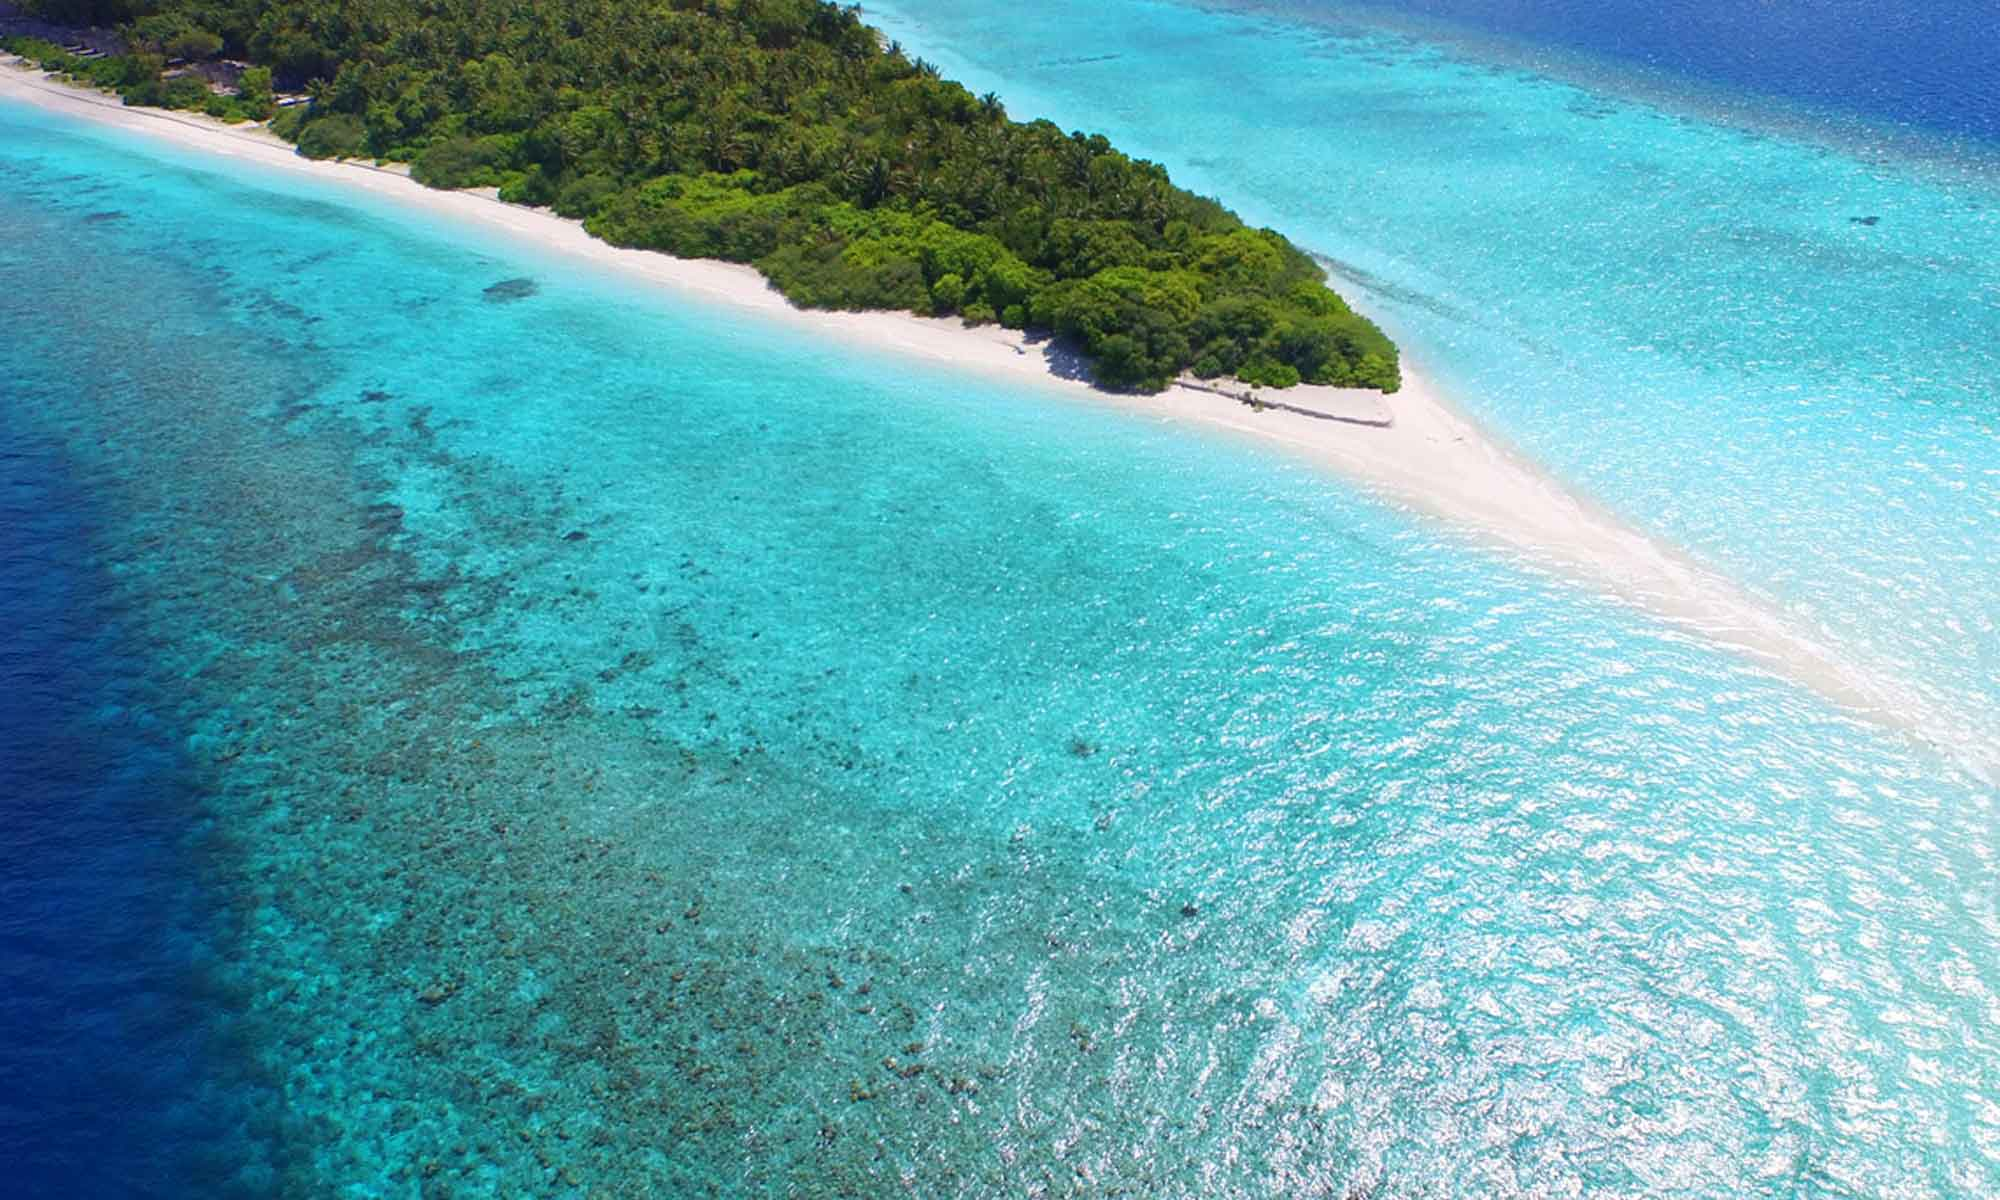 Slow Dive Indischer Ozean Malediven Dhigali Maldives